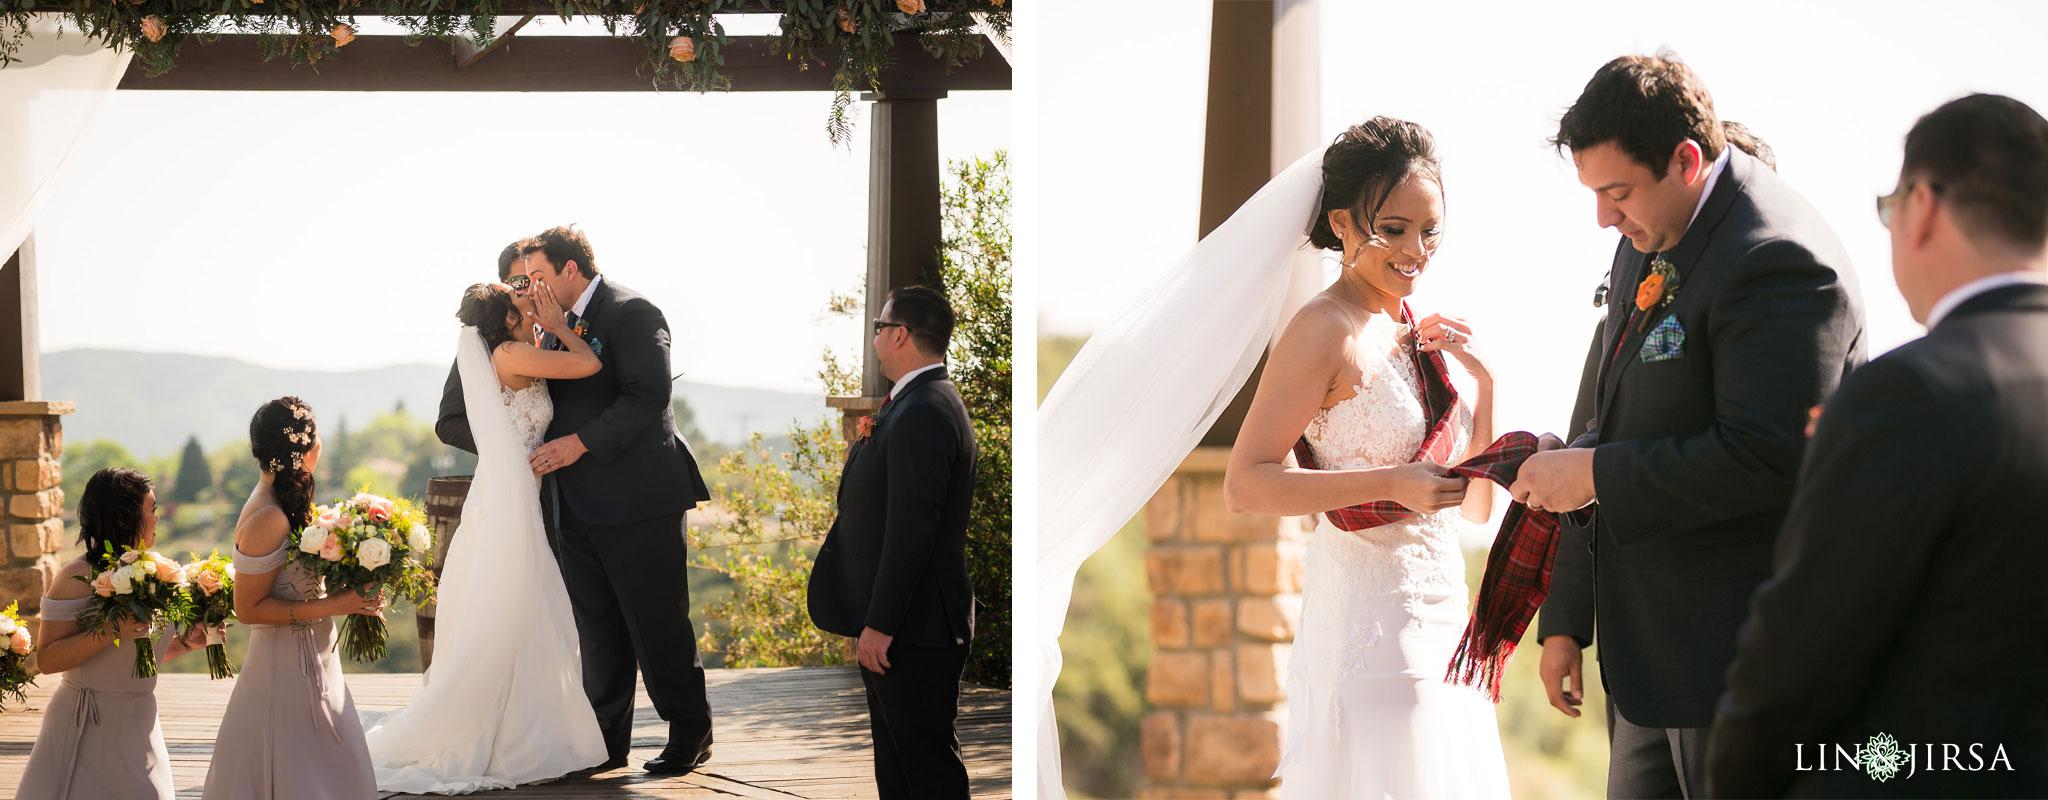 20 serendipity gardens oak glen wedding ceremony photography